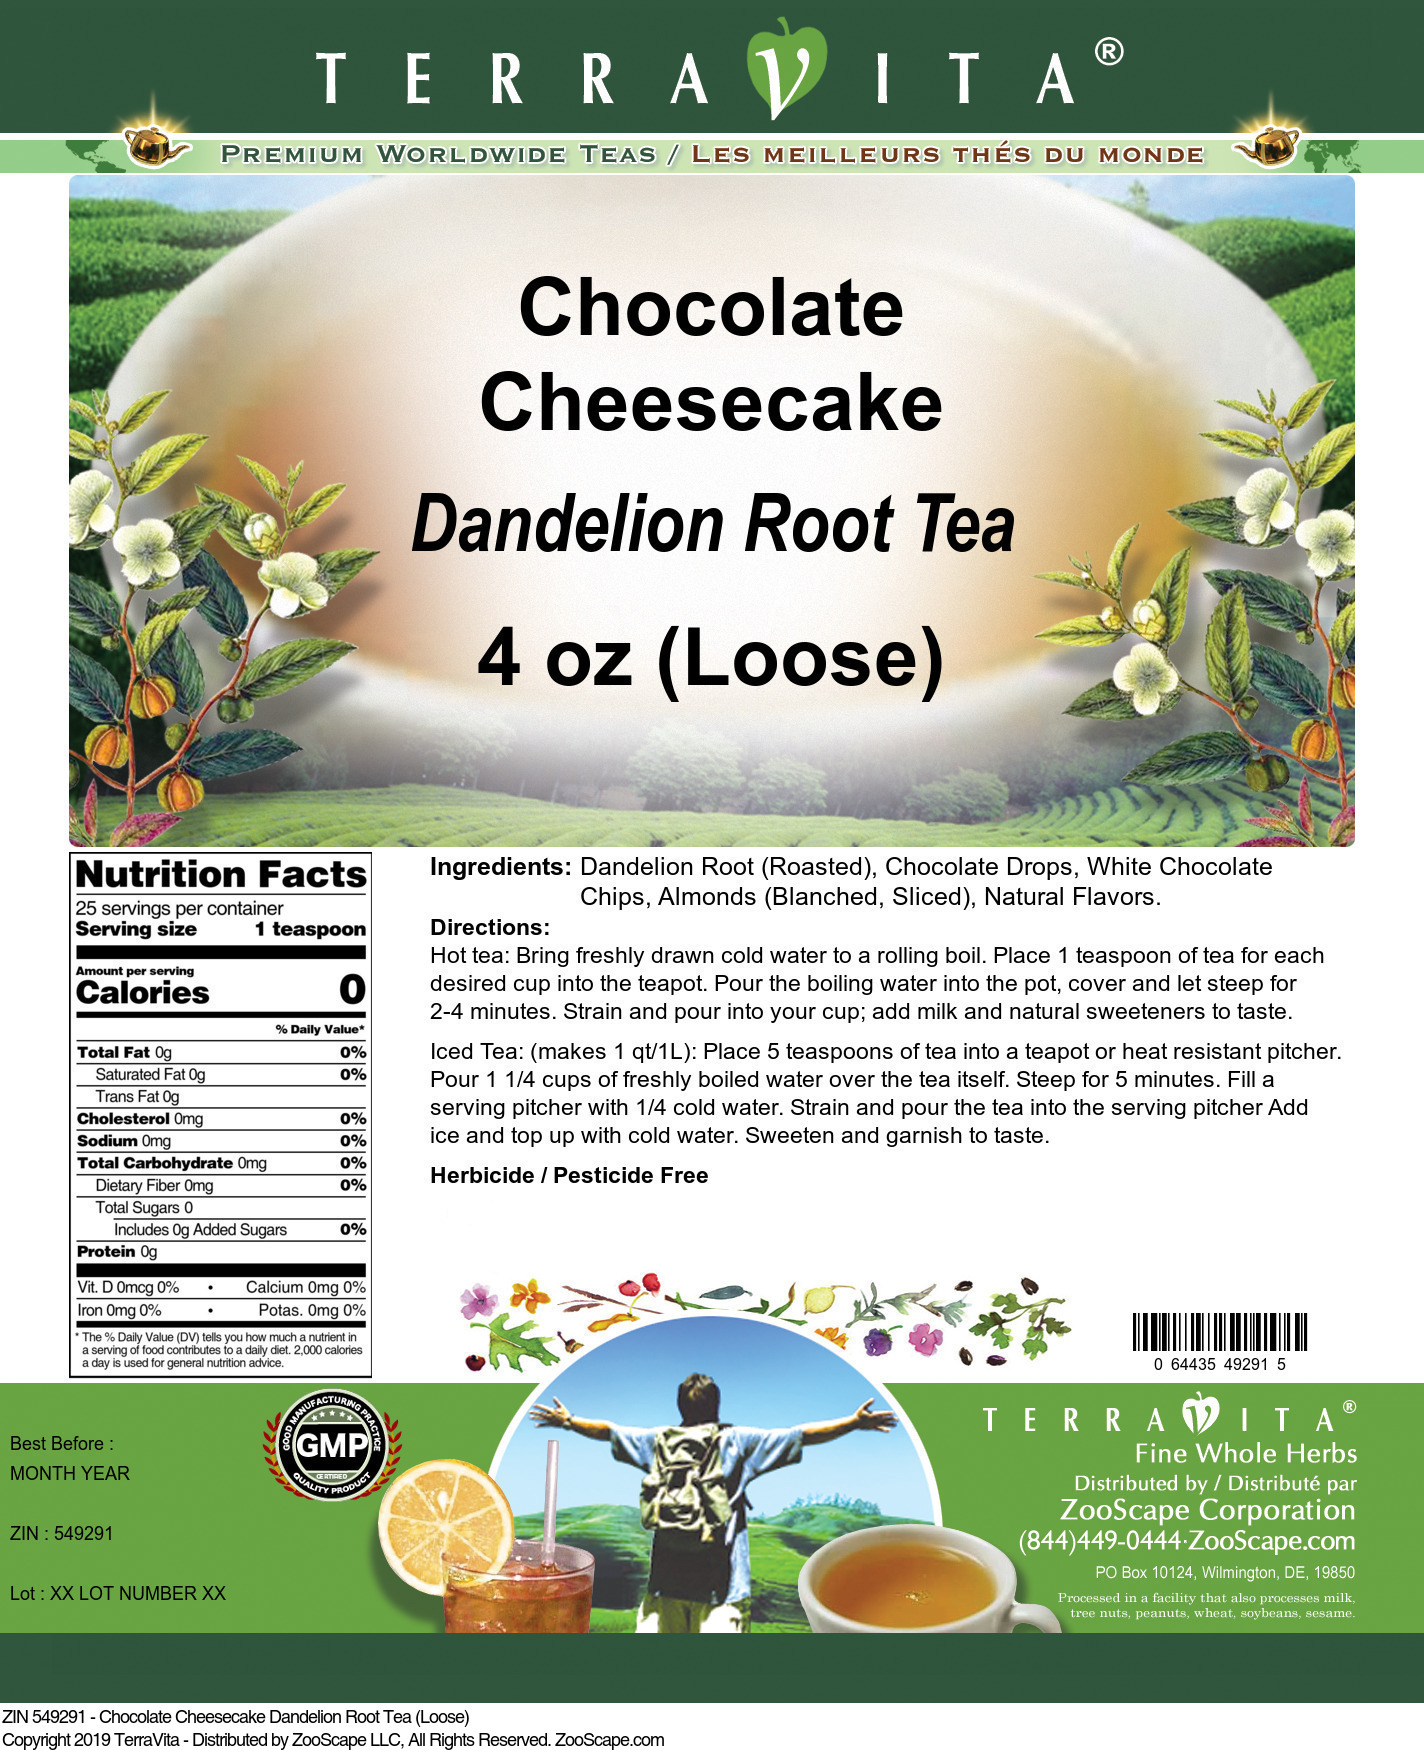 Chocolate Cheesecake Dandelion Root Tea (Loose)